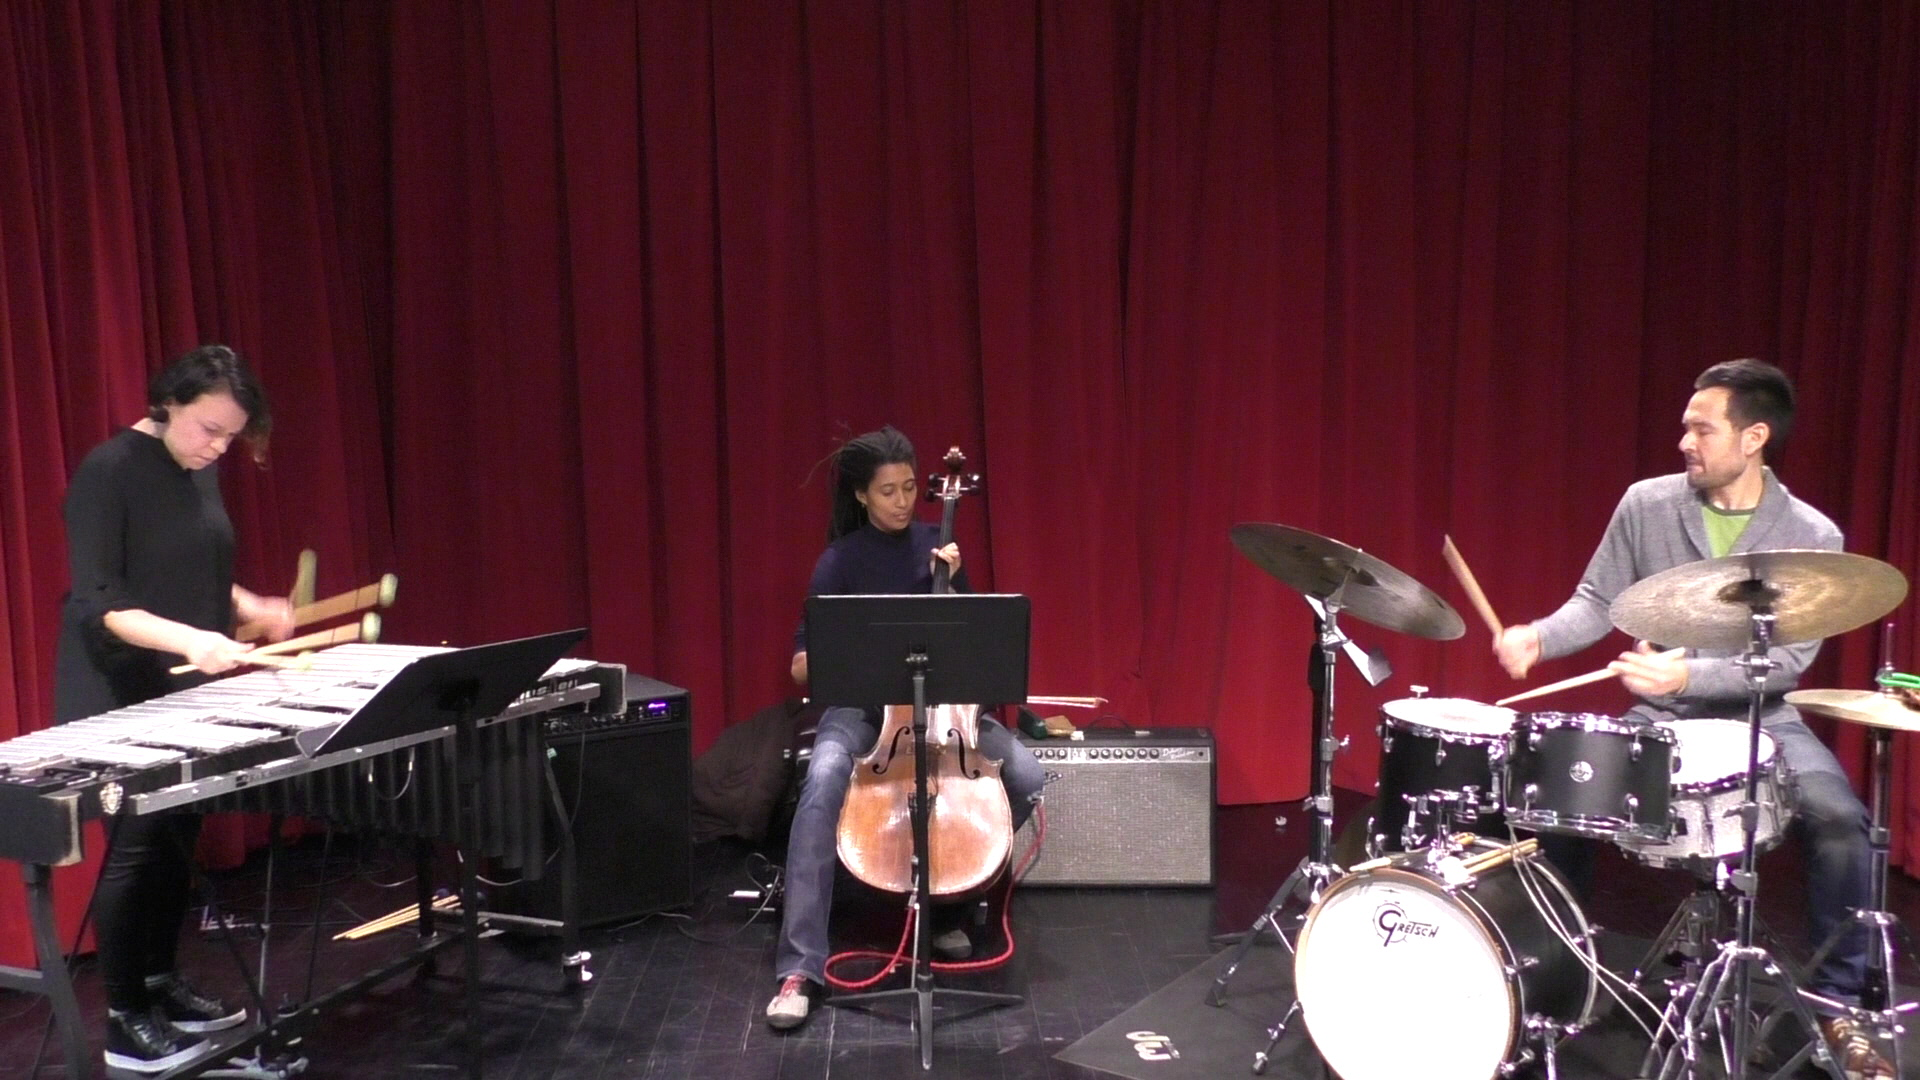 Live From New York: Wayne Escoffery, Mingus Big Band, Tomas Fujiwara, Mara Rosenbloom & The Ron Carter Big Band